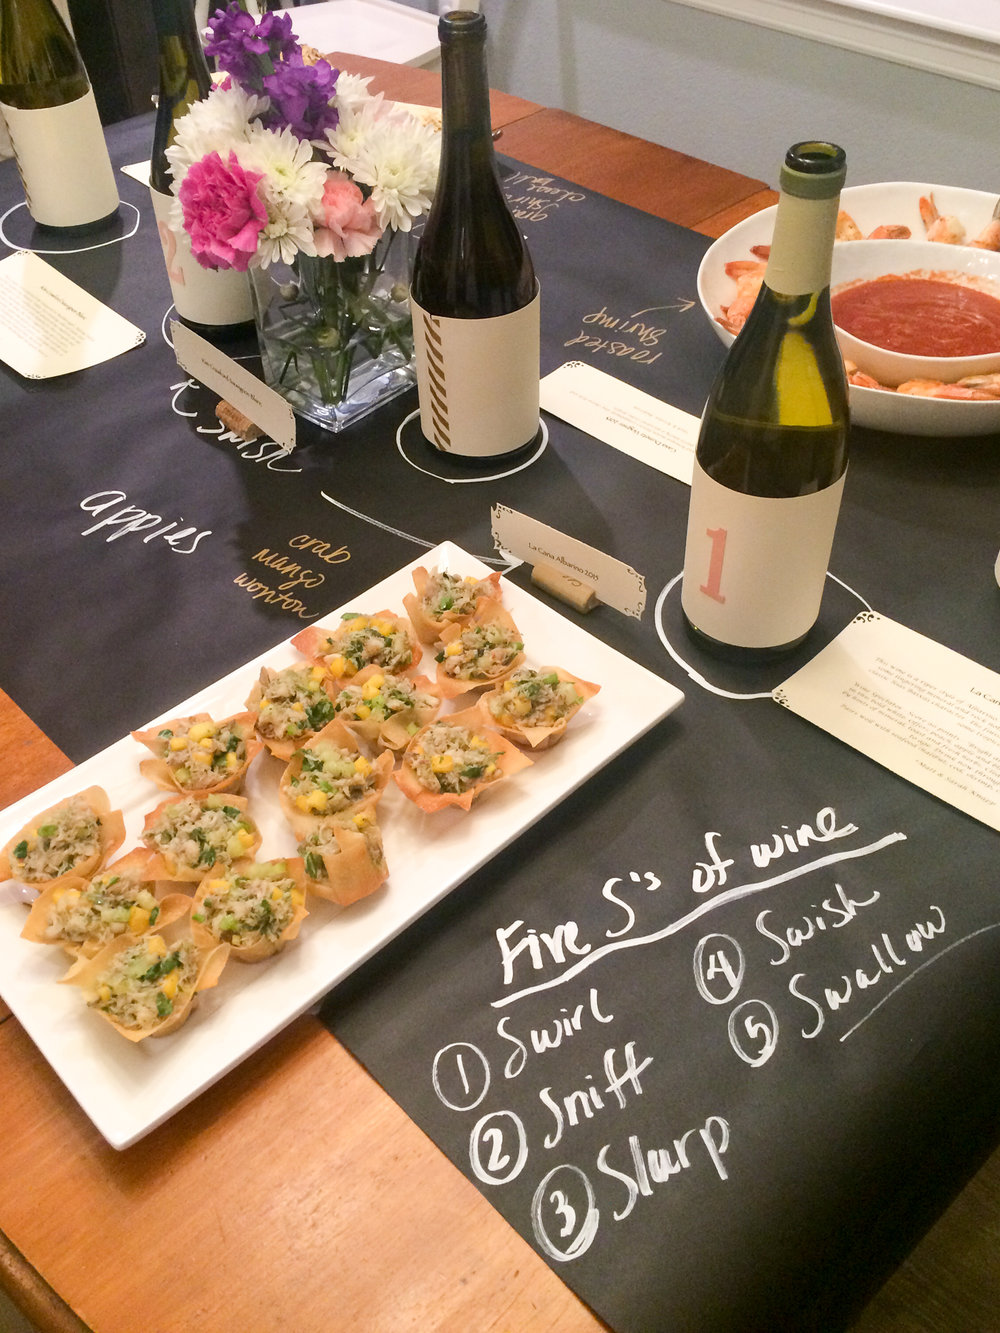 Wine Tasting Decorations - OhSoFancyParty.com